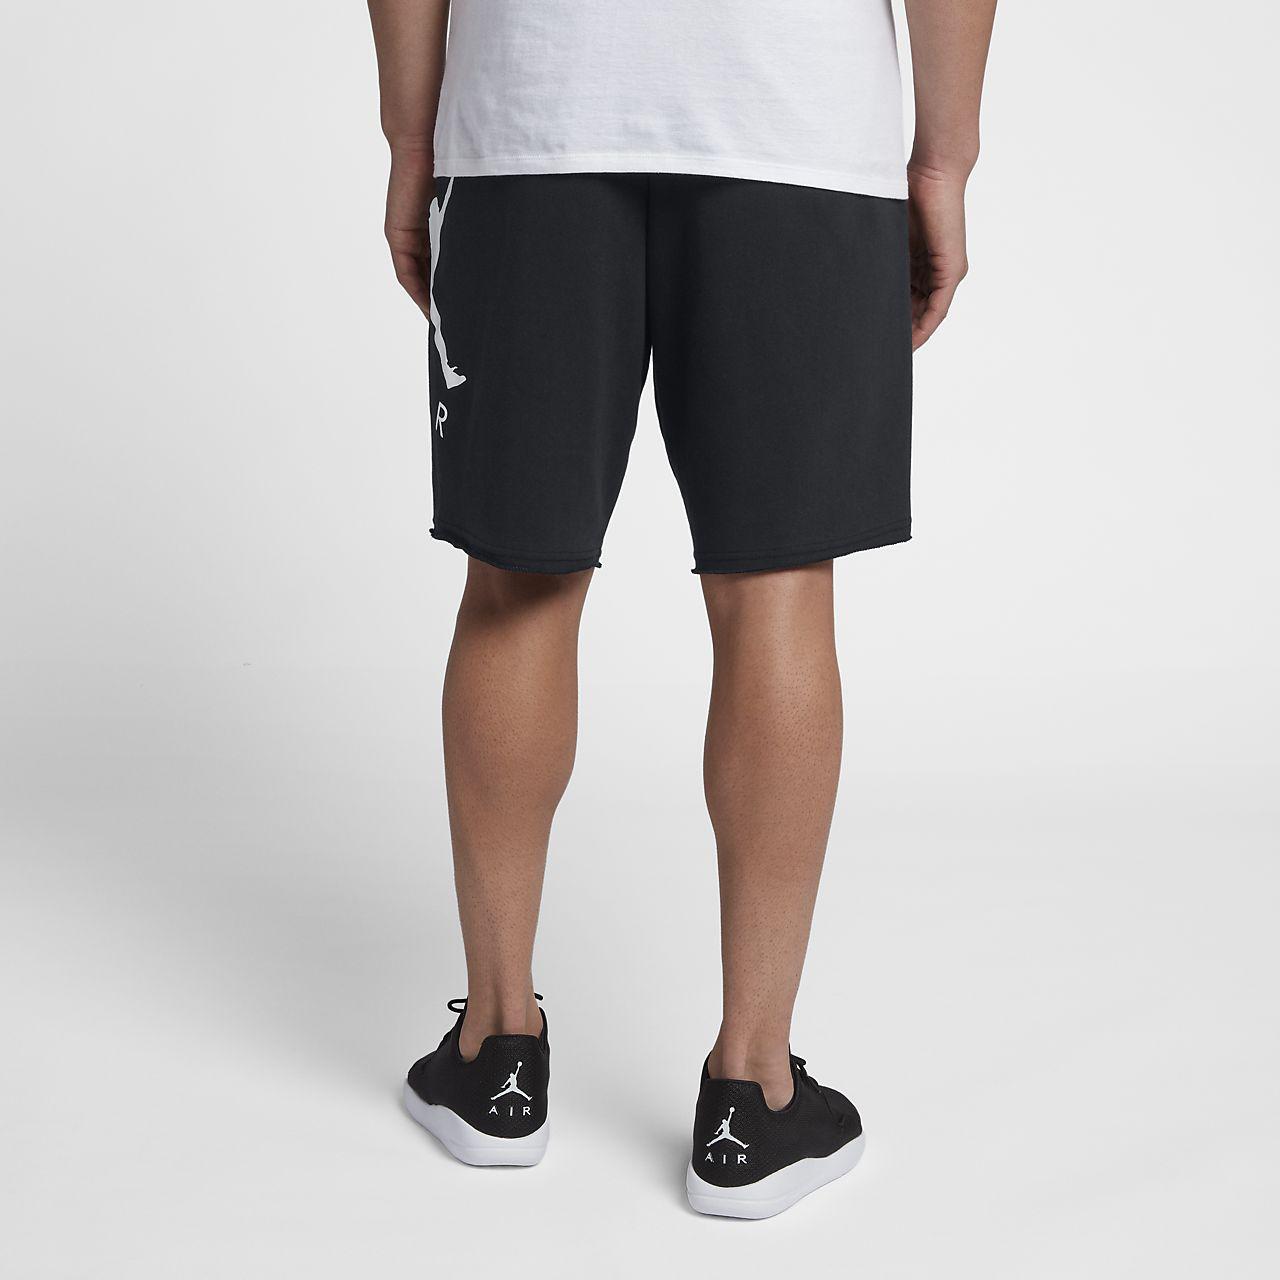 84dcb1ff5f4089 Jordan Jumpman Air Men s Fleece Shorts. Nike.com ID